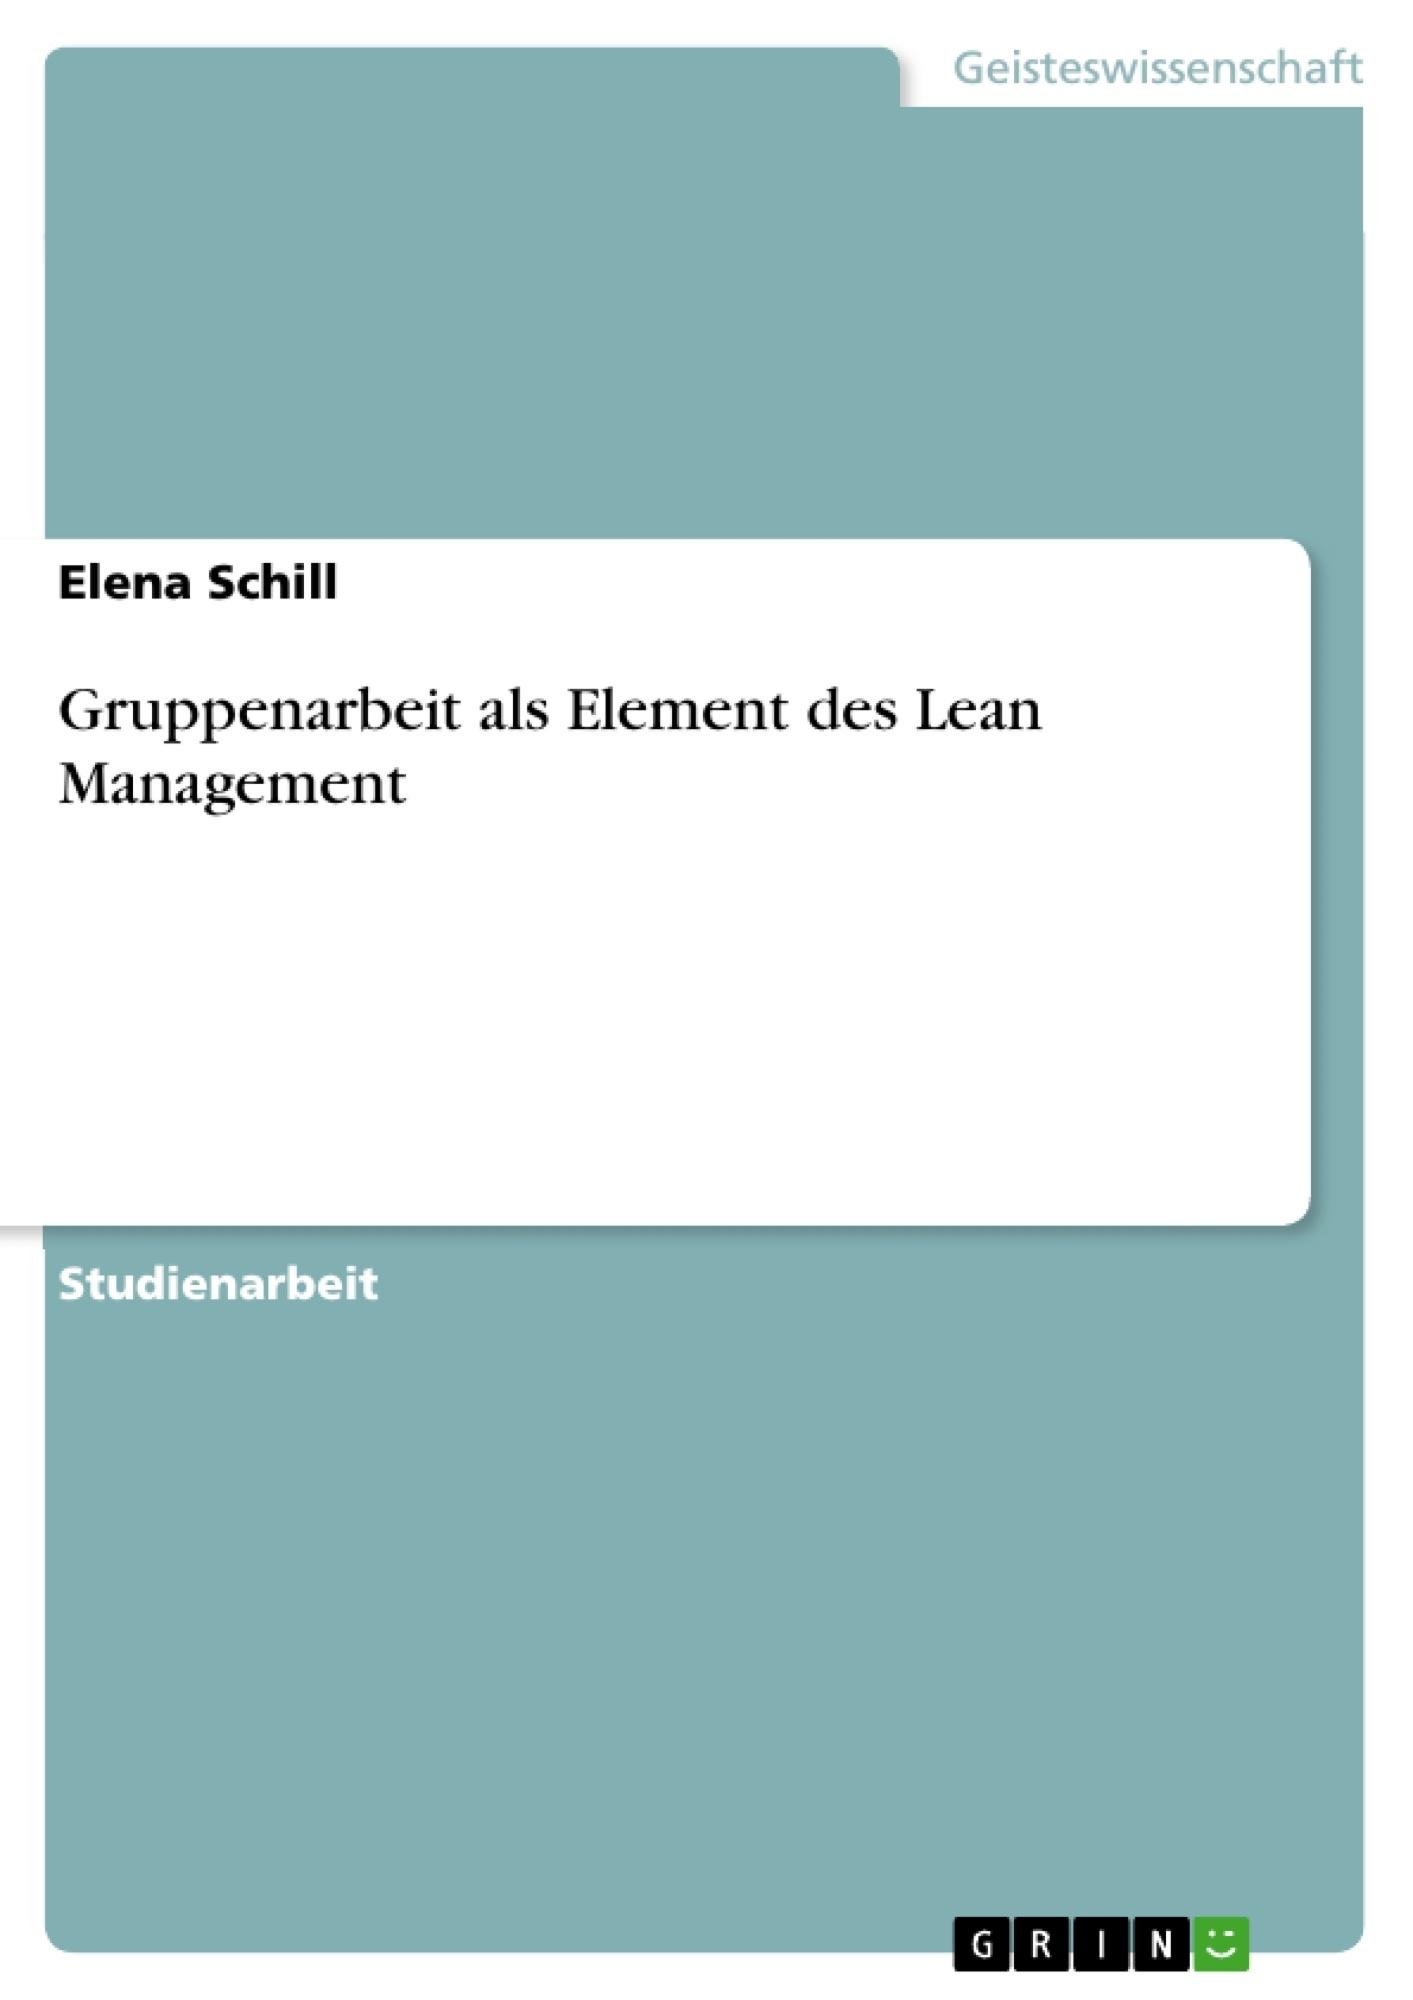 Titel: Gruppenarbeit als Element des Lean Management